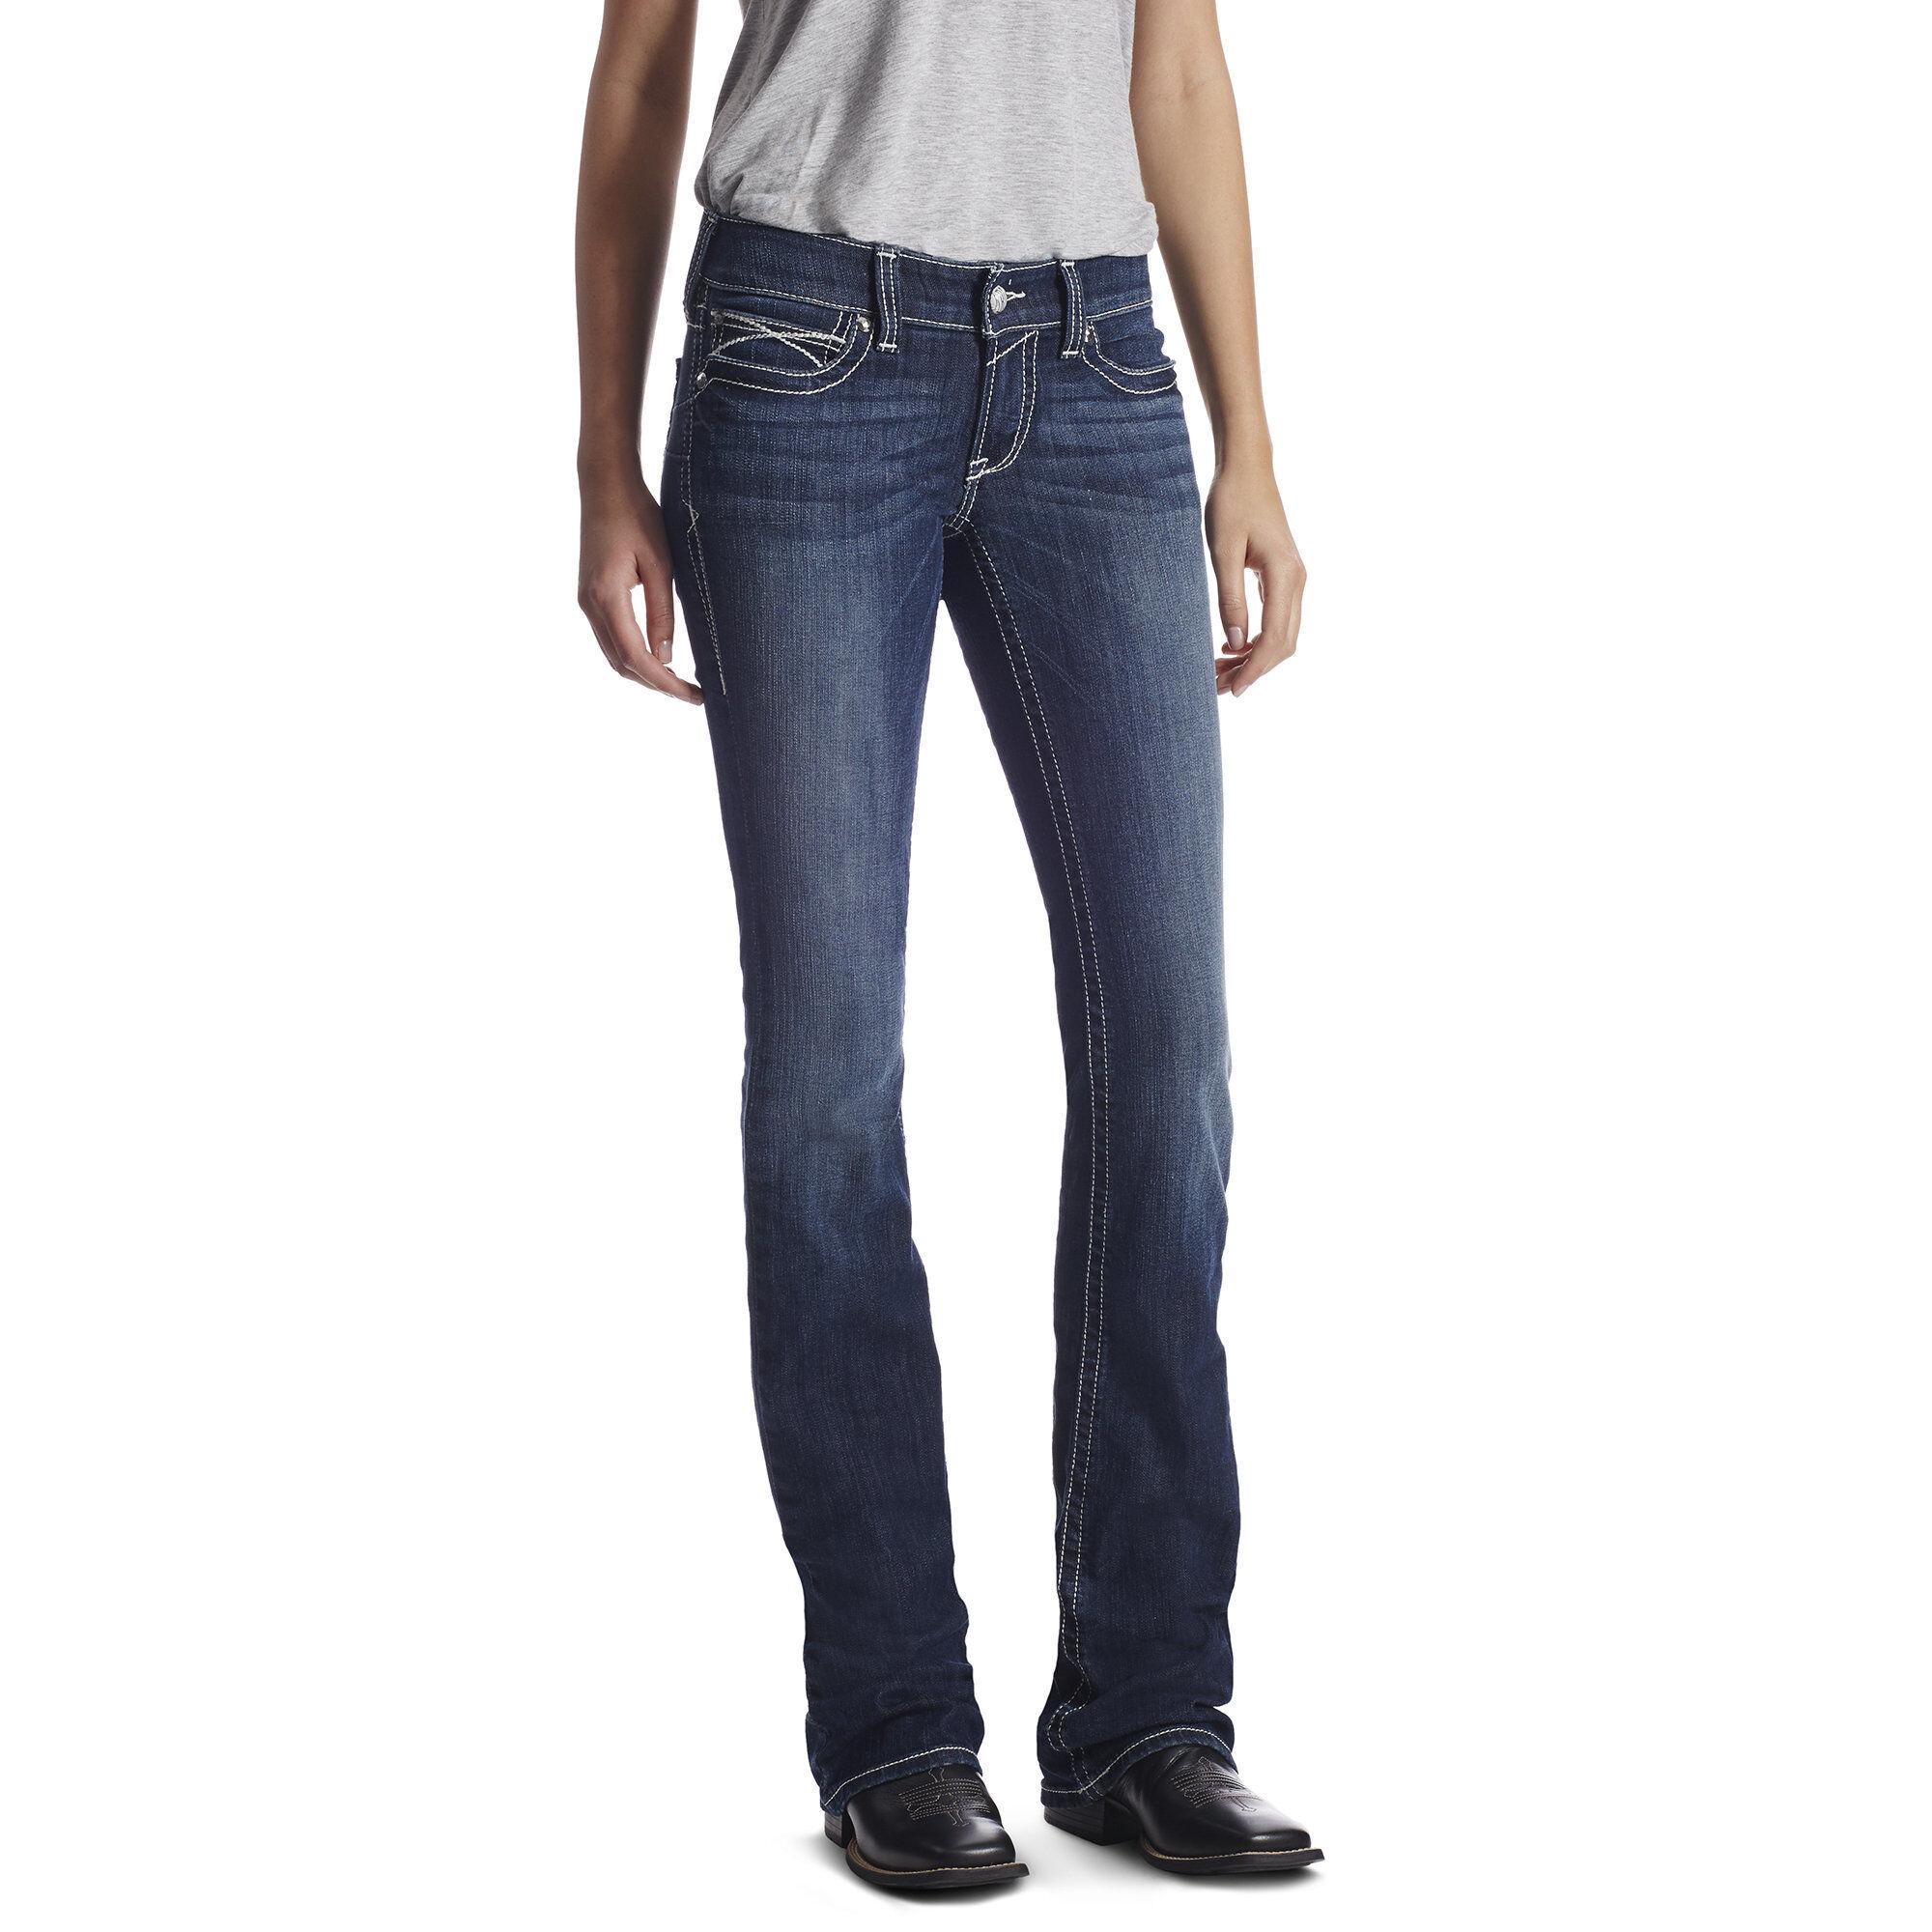 R.E.A.L Low Rise Rosy Whipstitch Boot Cut Jean